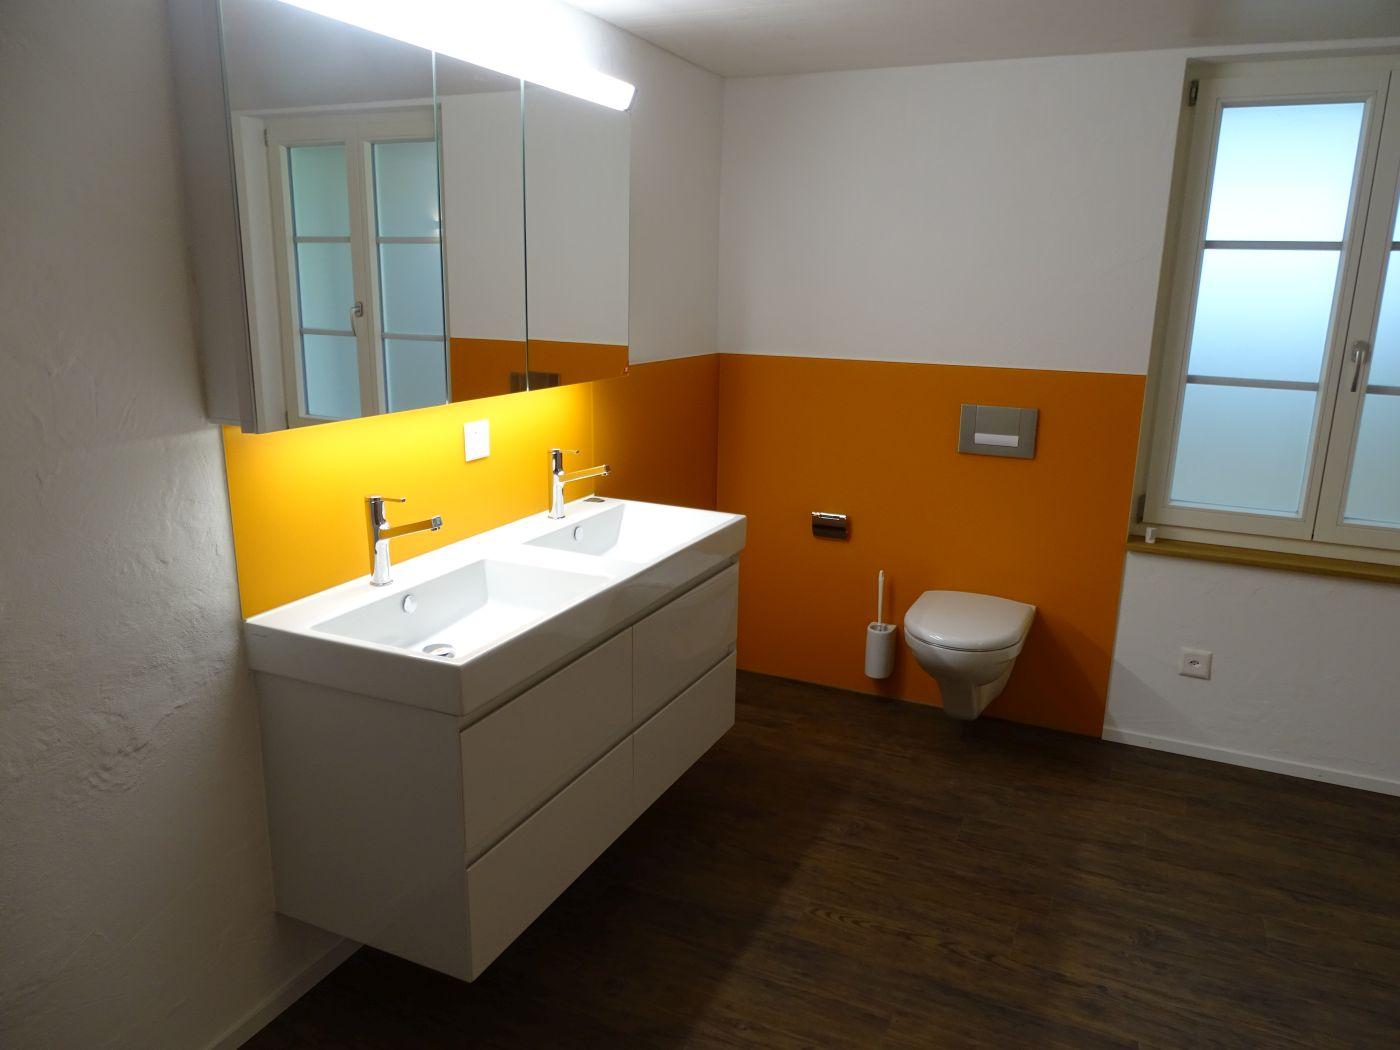 wandverkleidung badezimmer hausgestaltung. Black Bedroom Furniture Sets. Home Design Ideas